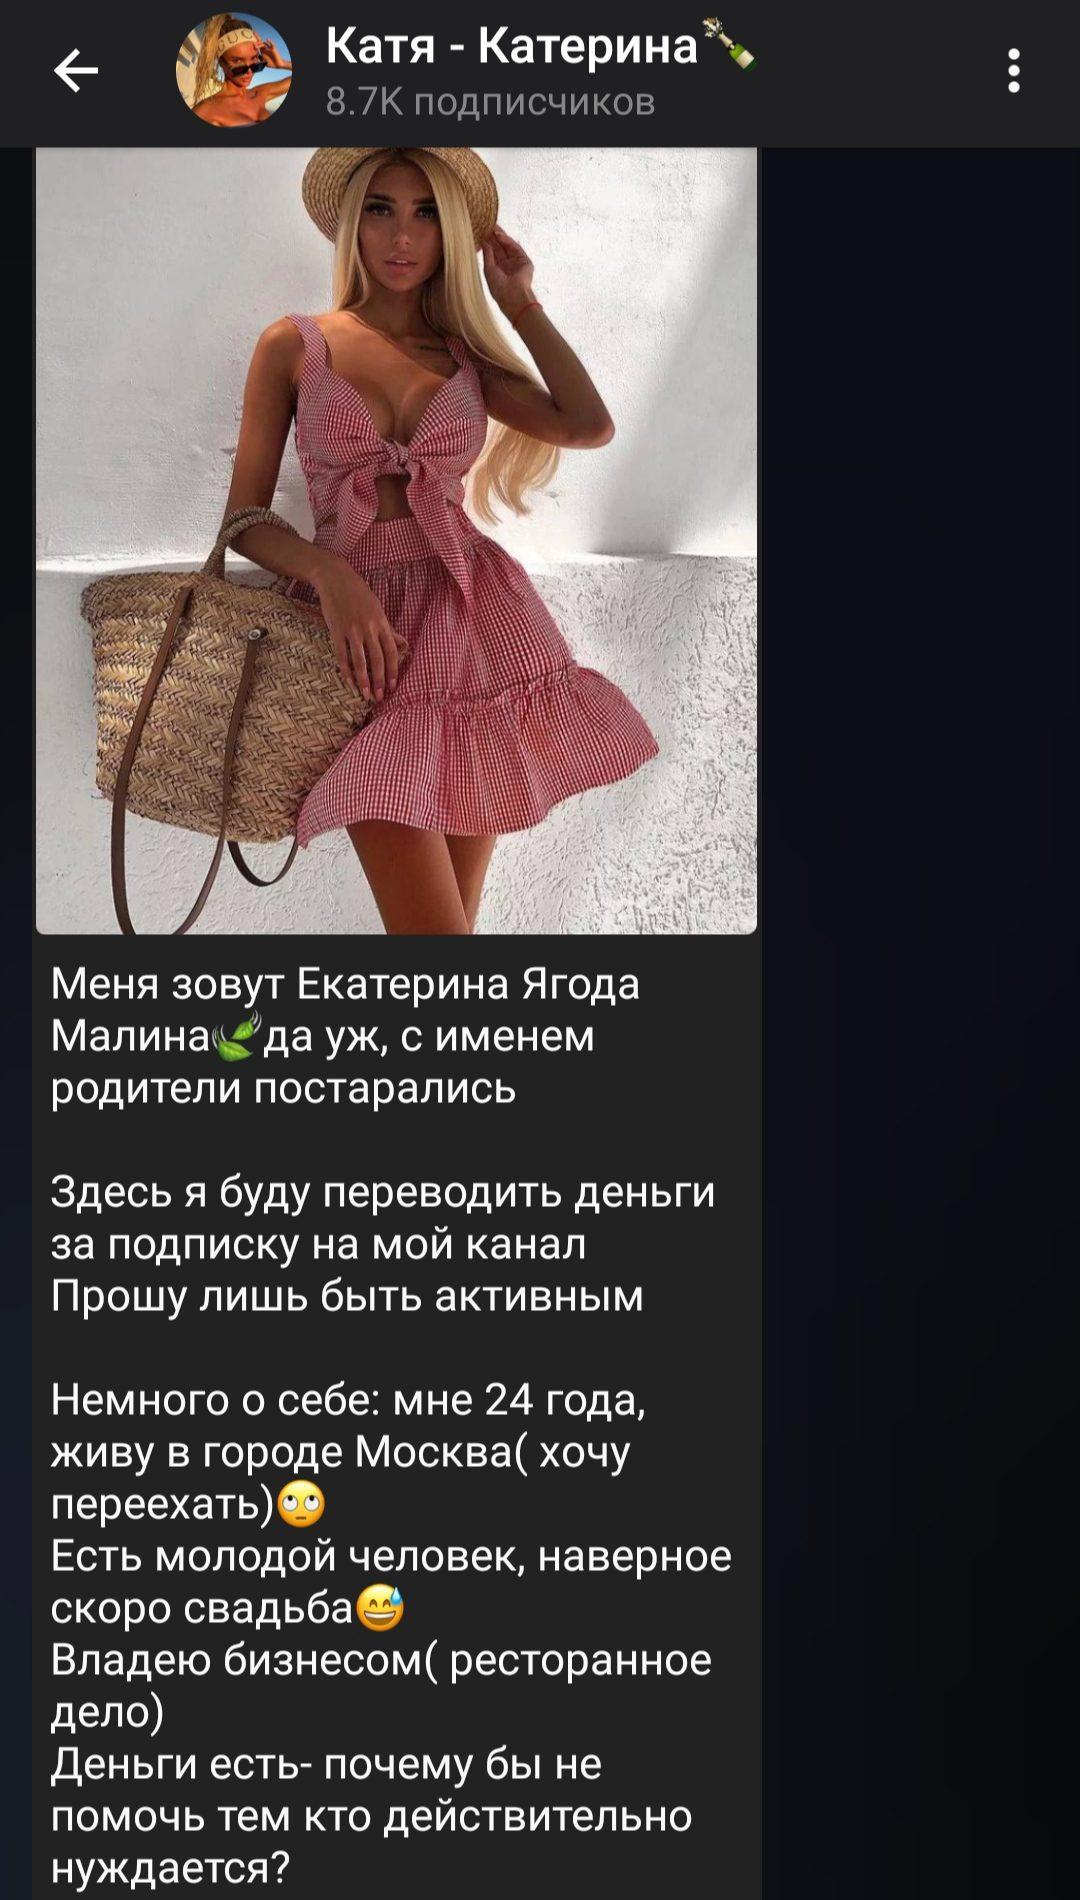 Аккаунты-клоны Катя-Катерина Телеграм